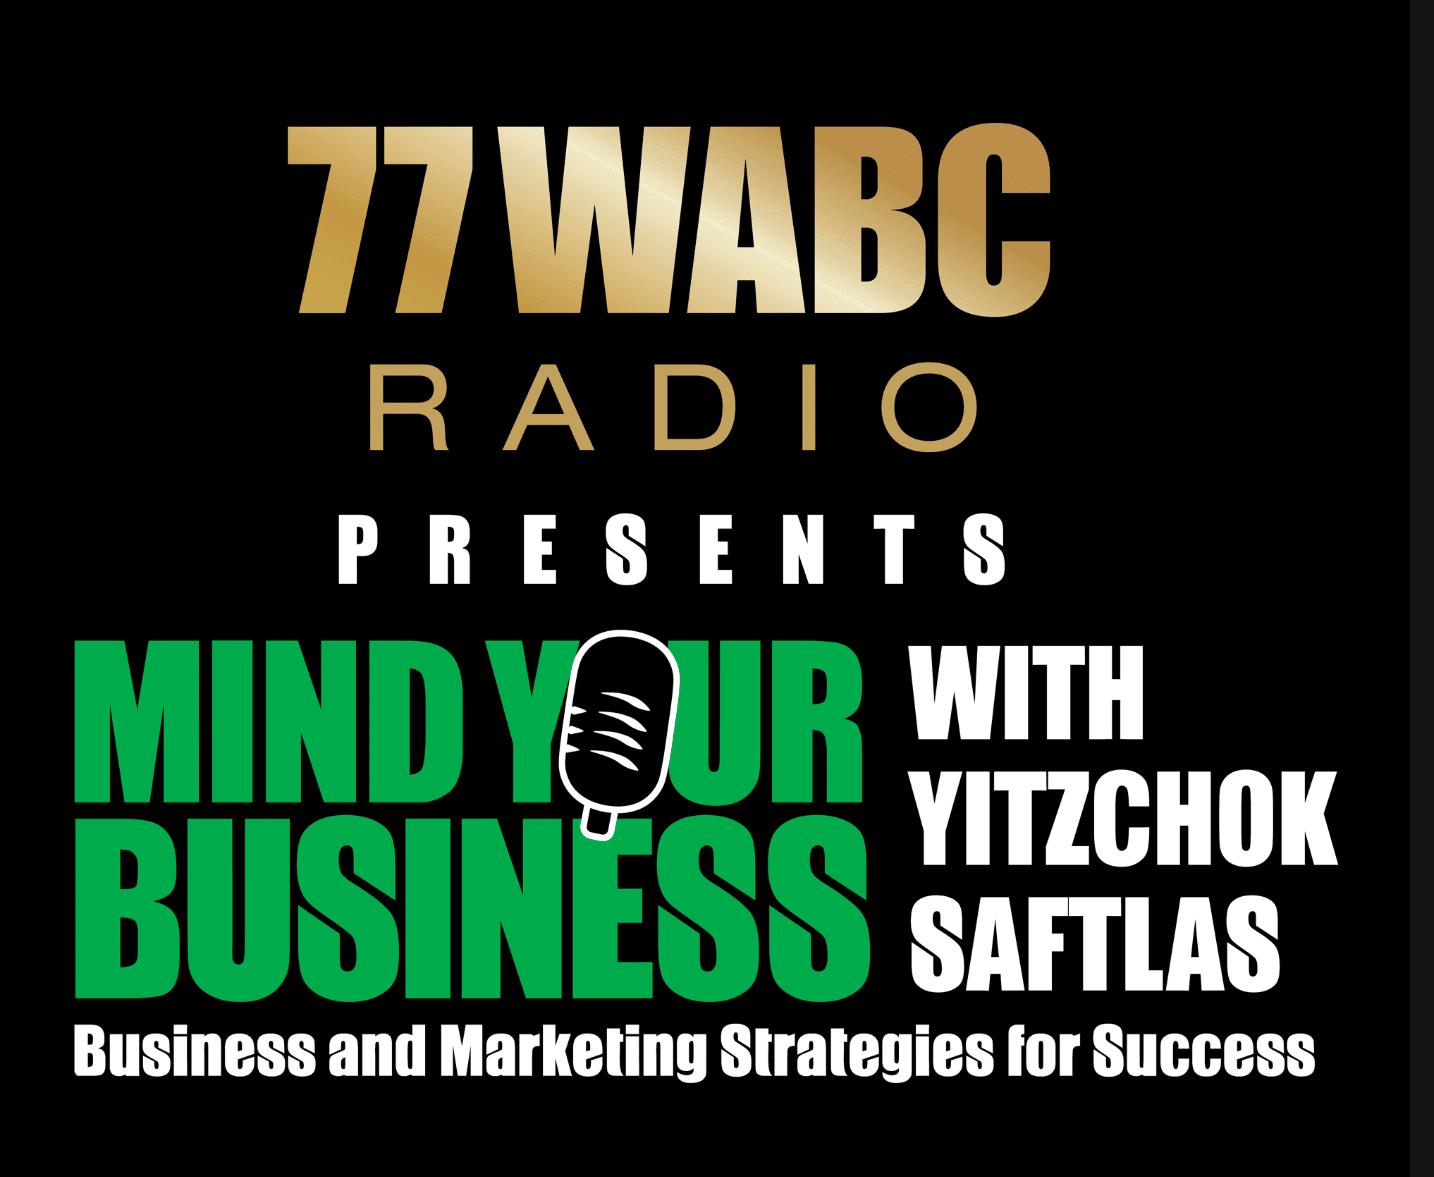 Mind Your Business with Yitzchok Saftlas